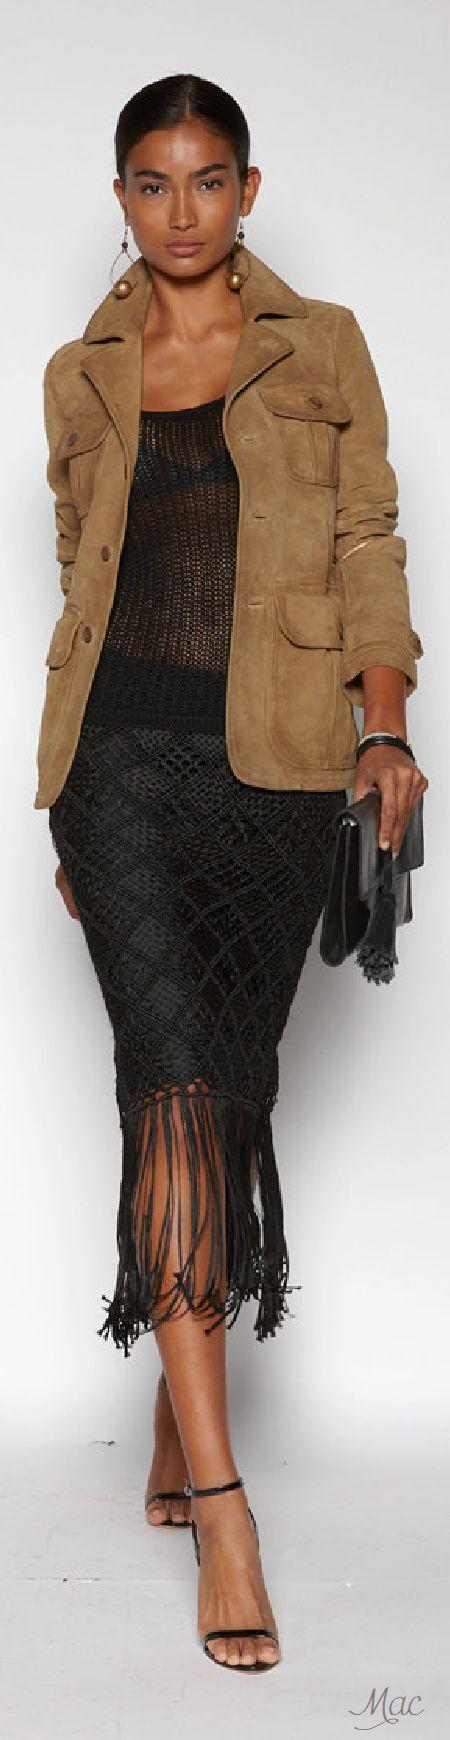 Polo Ralph Lauren S-16 RTW: sahariana jacket, knitted top, fringed skirt